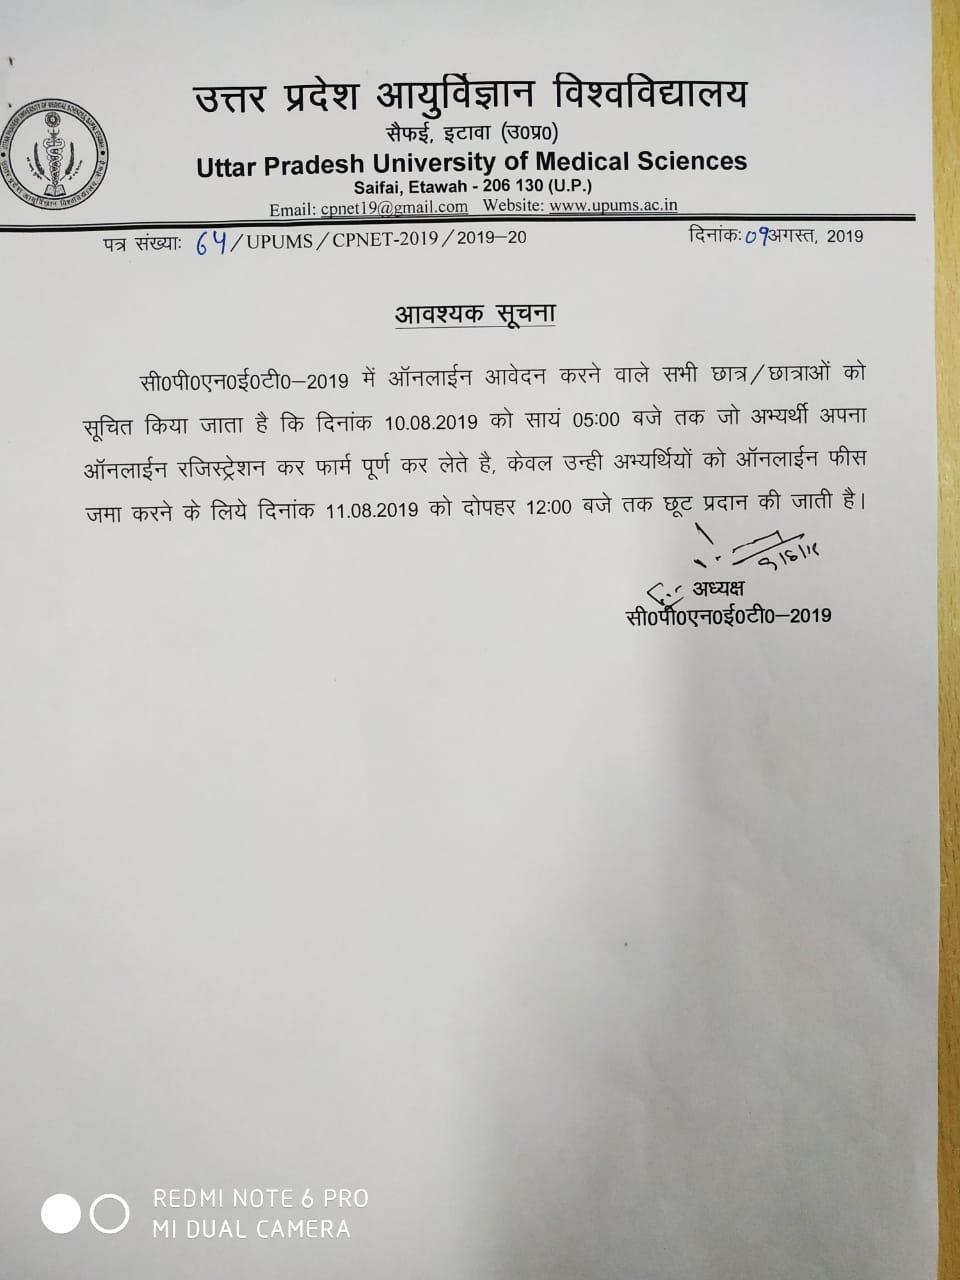 Official website of the Uttar Pradesh University of Medical